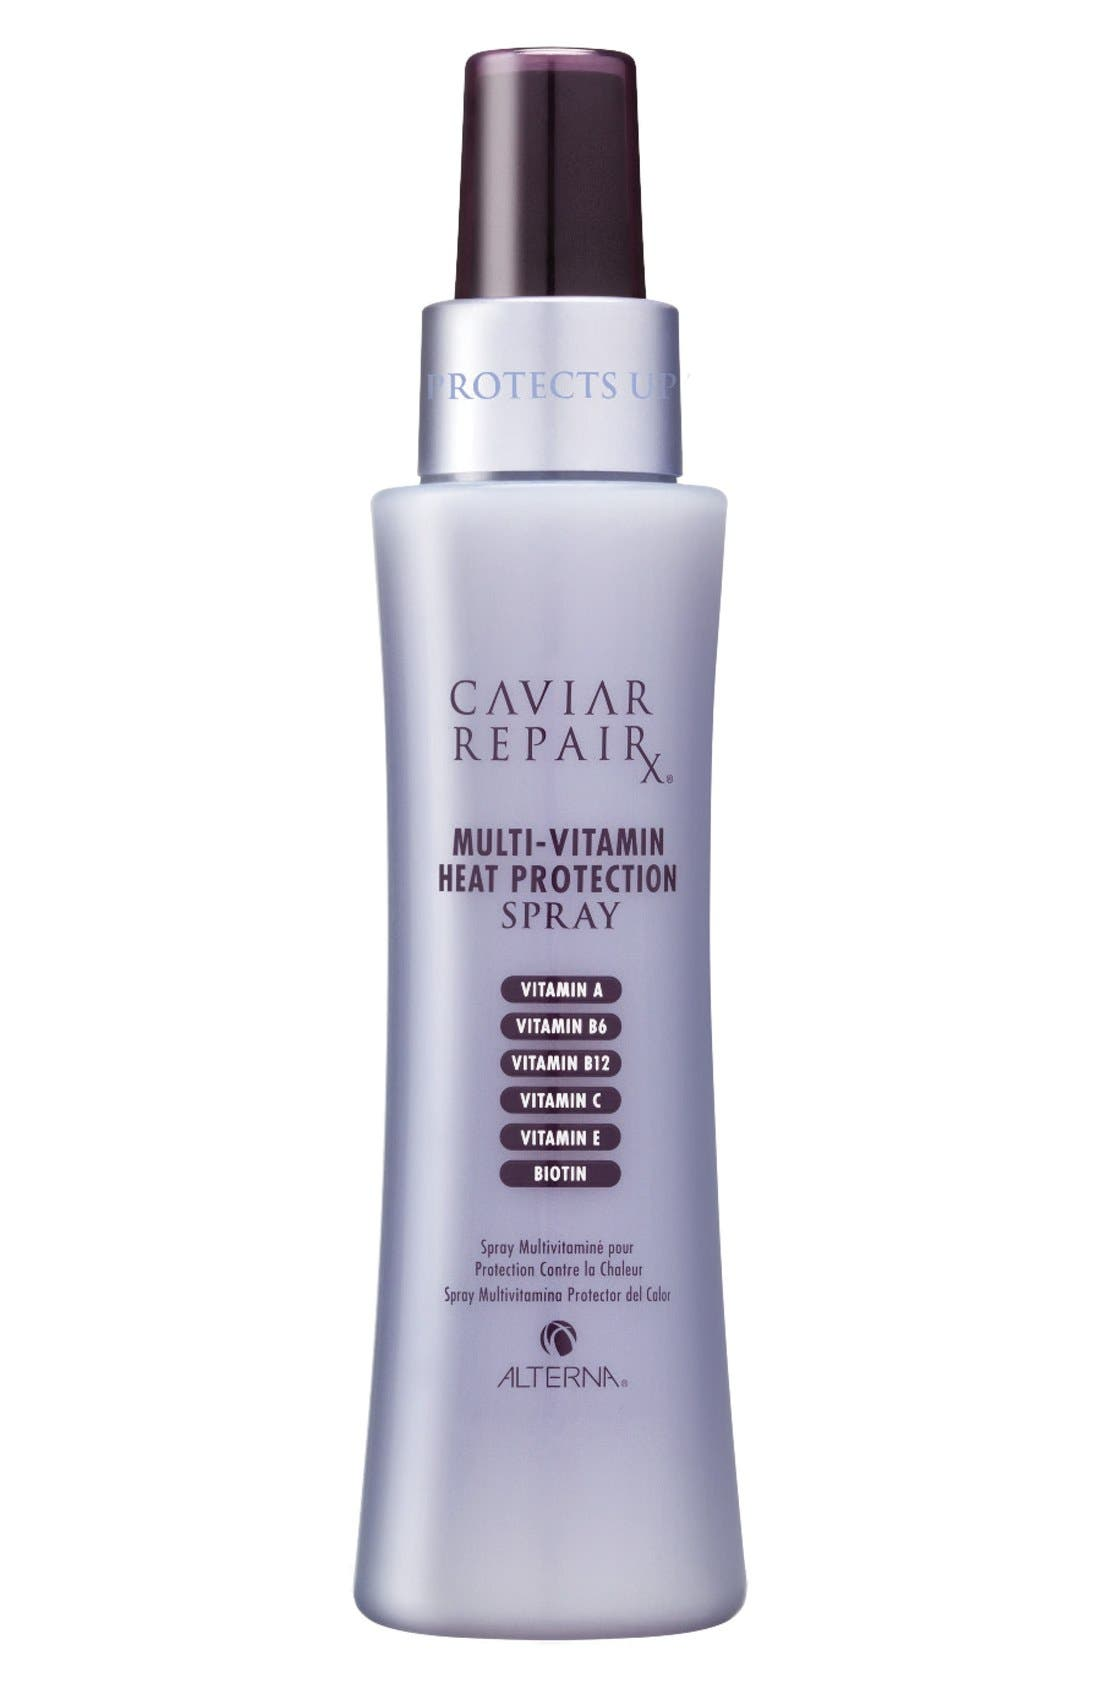 Caviar Repair Rx Multi-Vitamin Heat Protection Spray,                         Main,                         color,